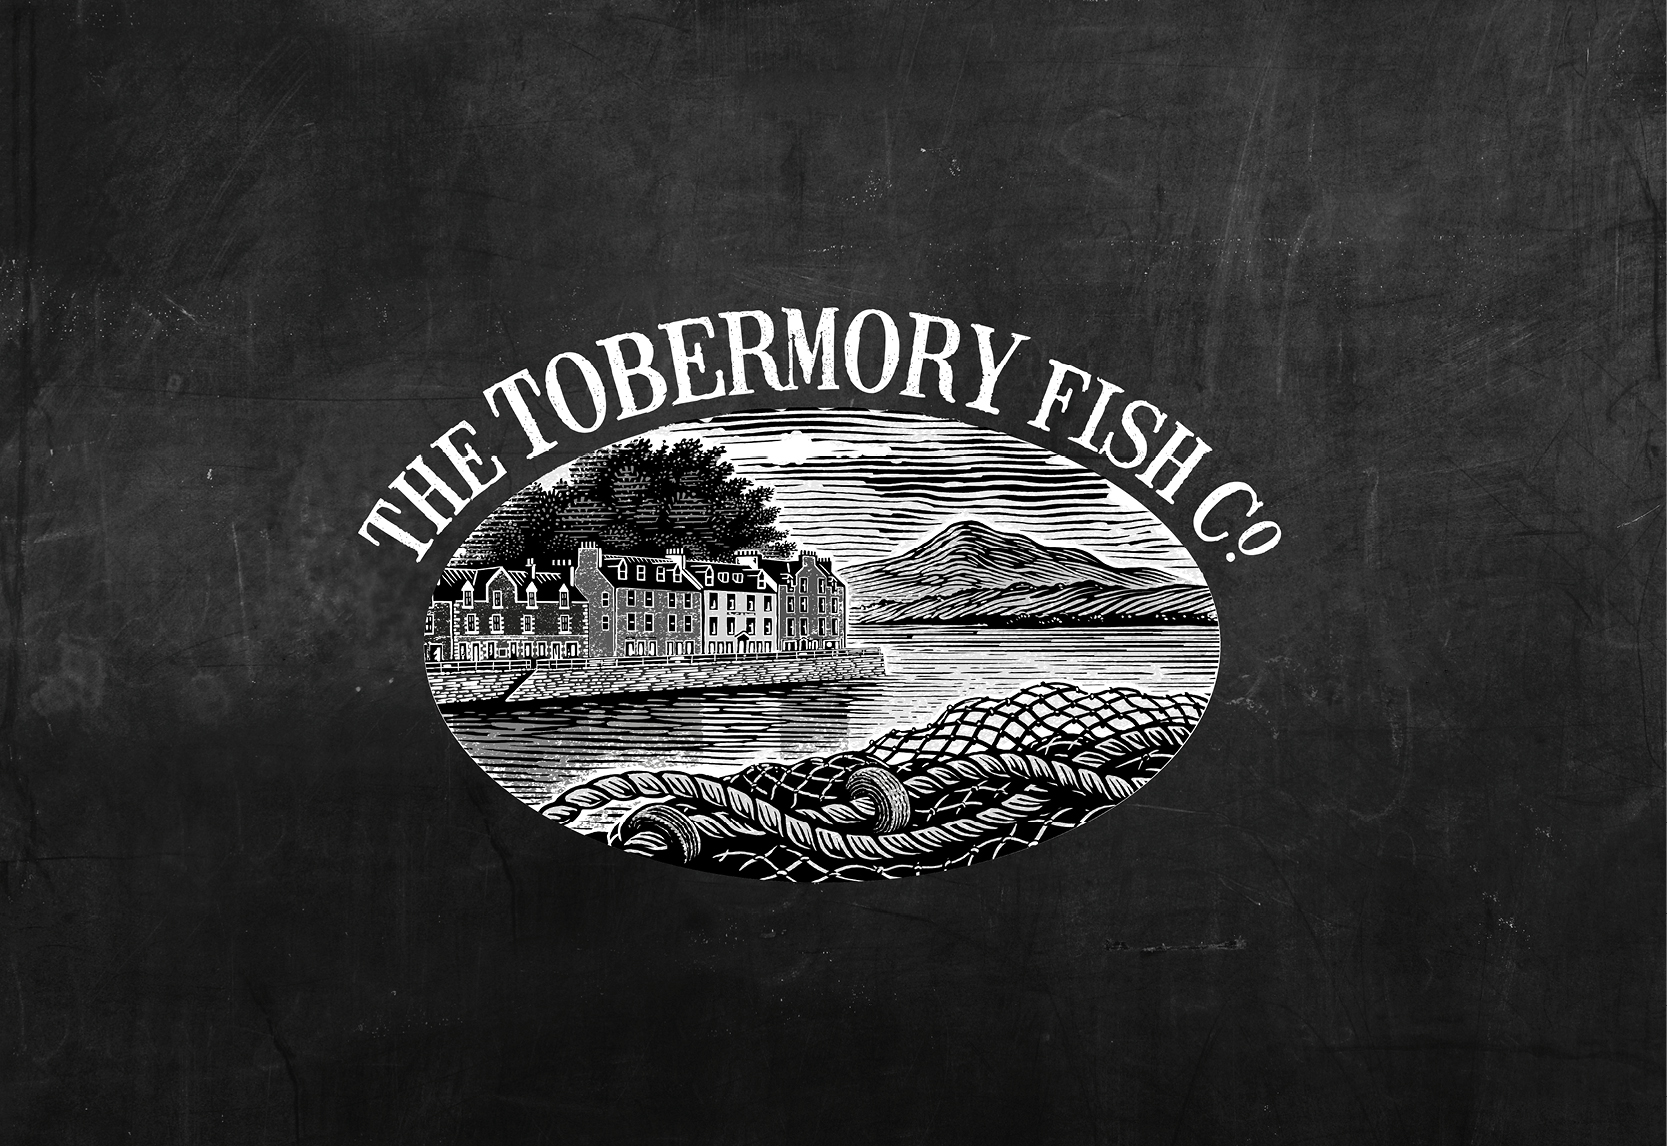 Tobermory Fish Co